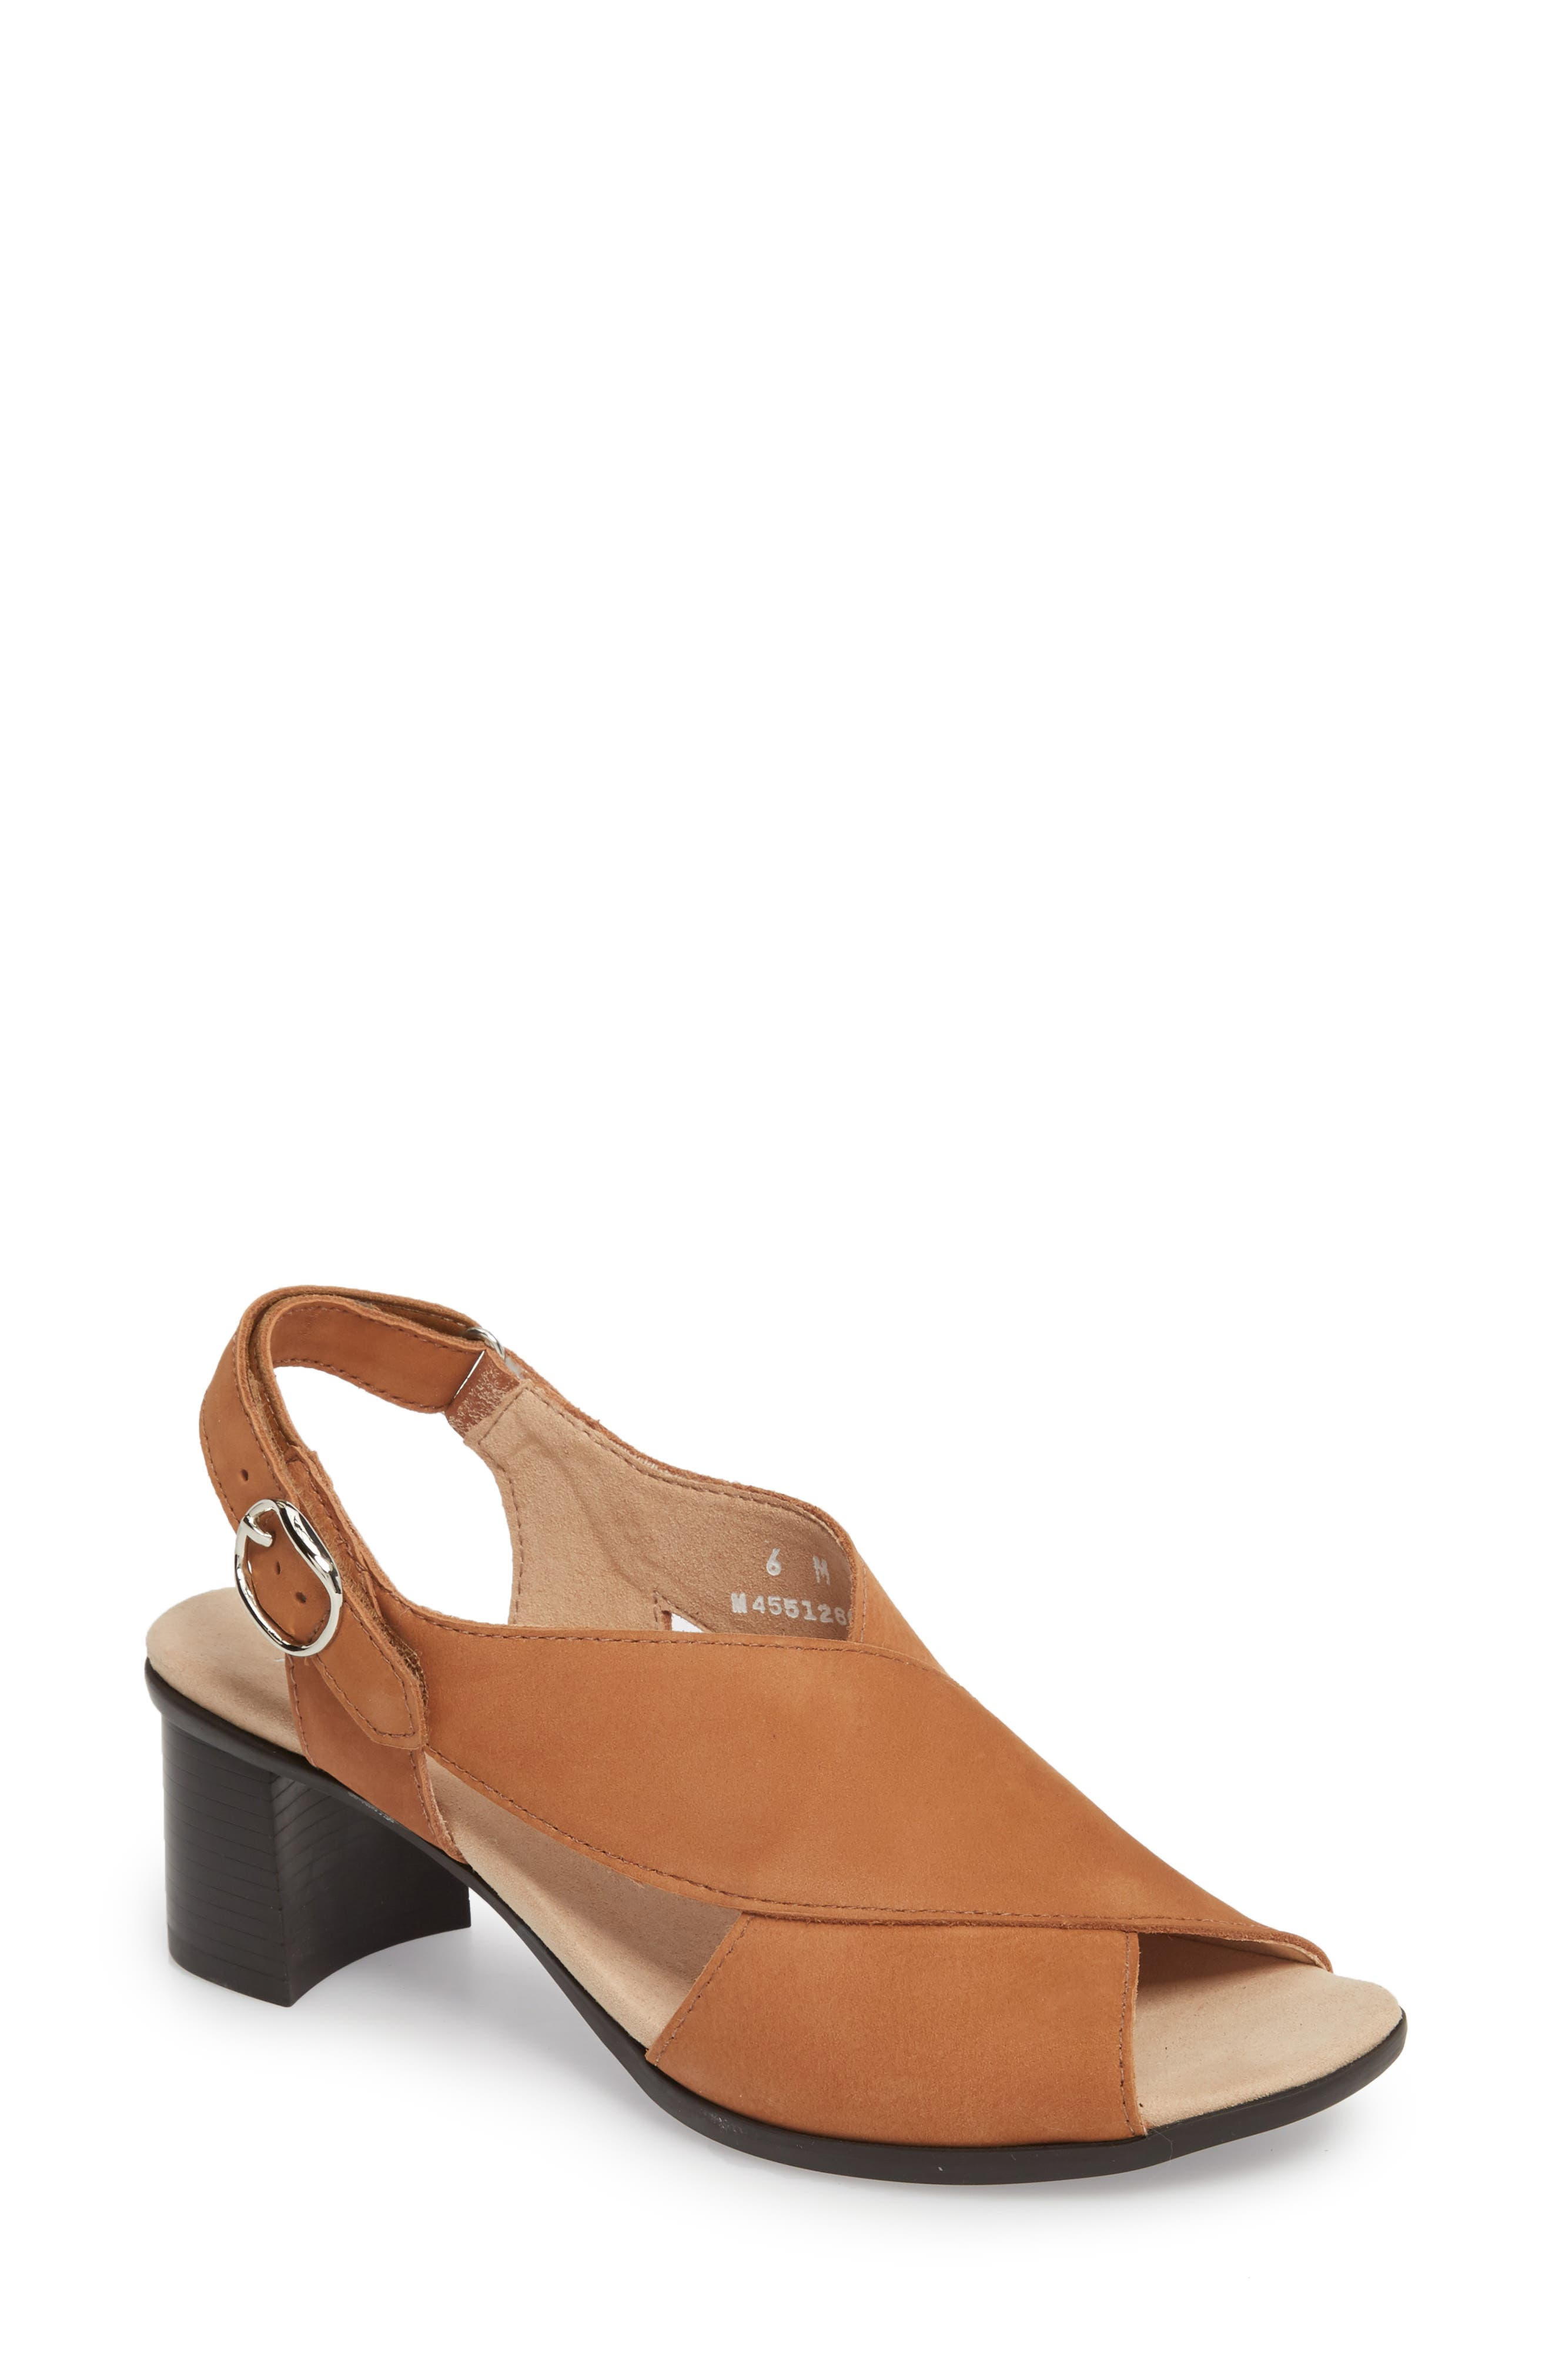 Laine Block Heel Sandal,                             Main thumbnail 1, color,                             Brown Nubuck Leather